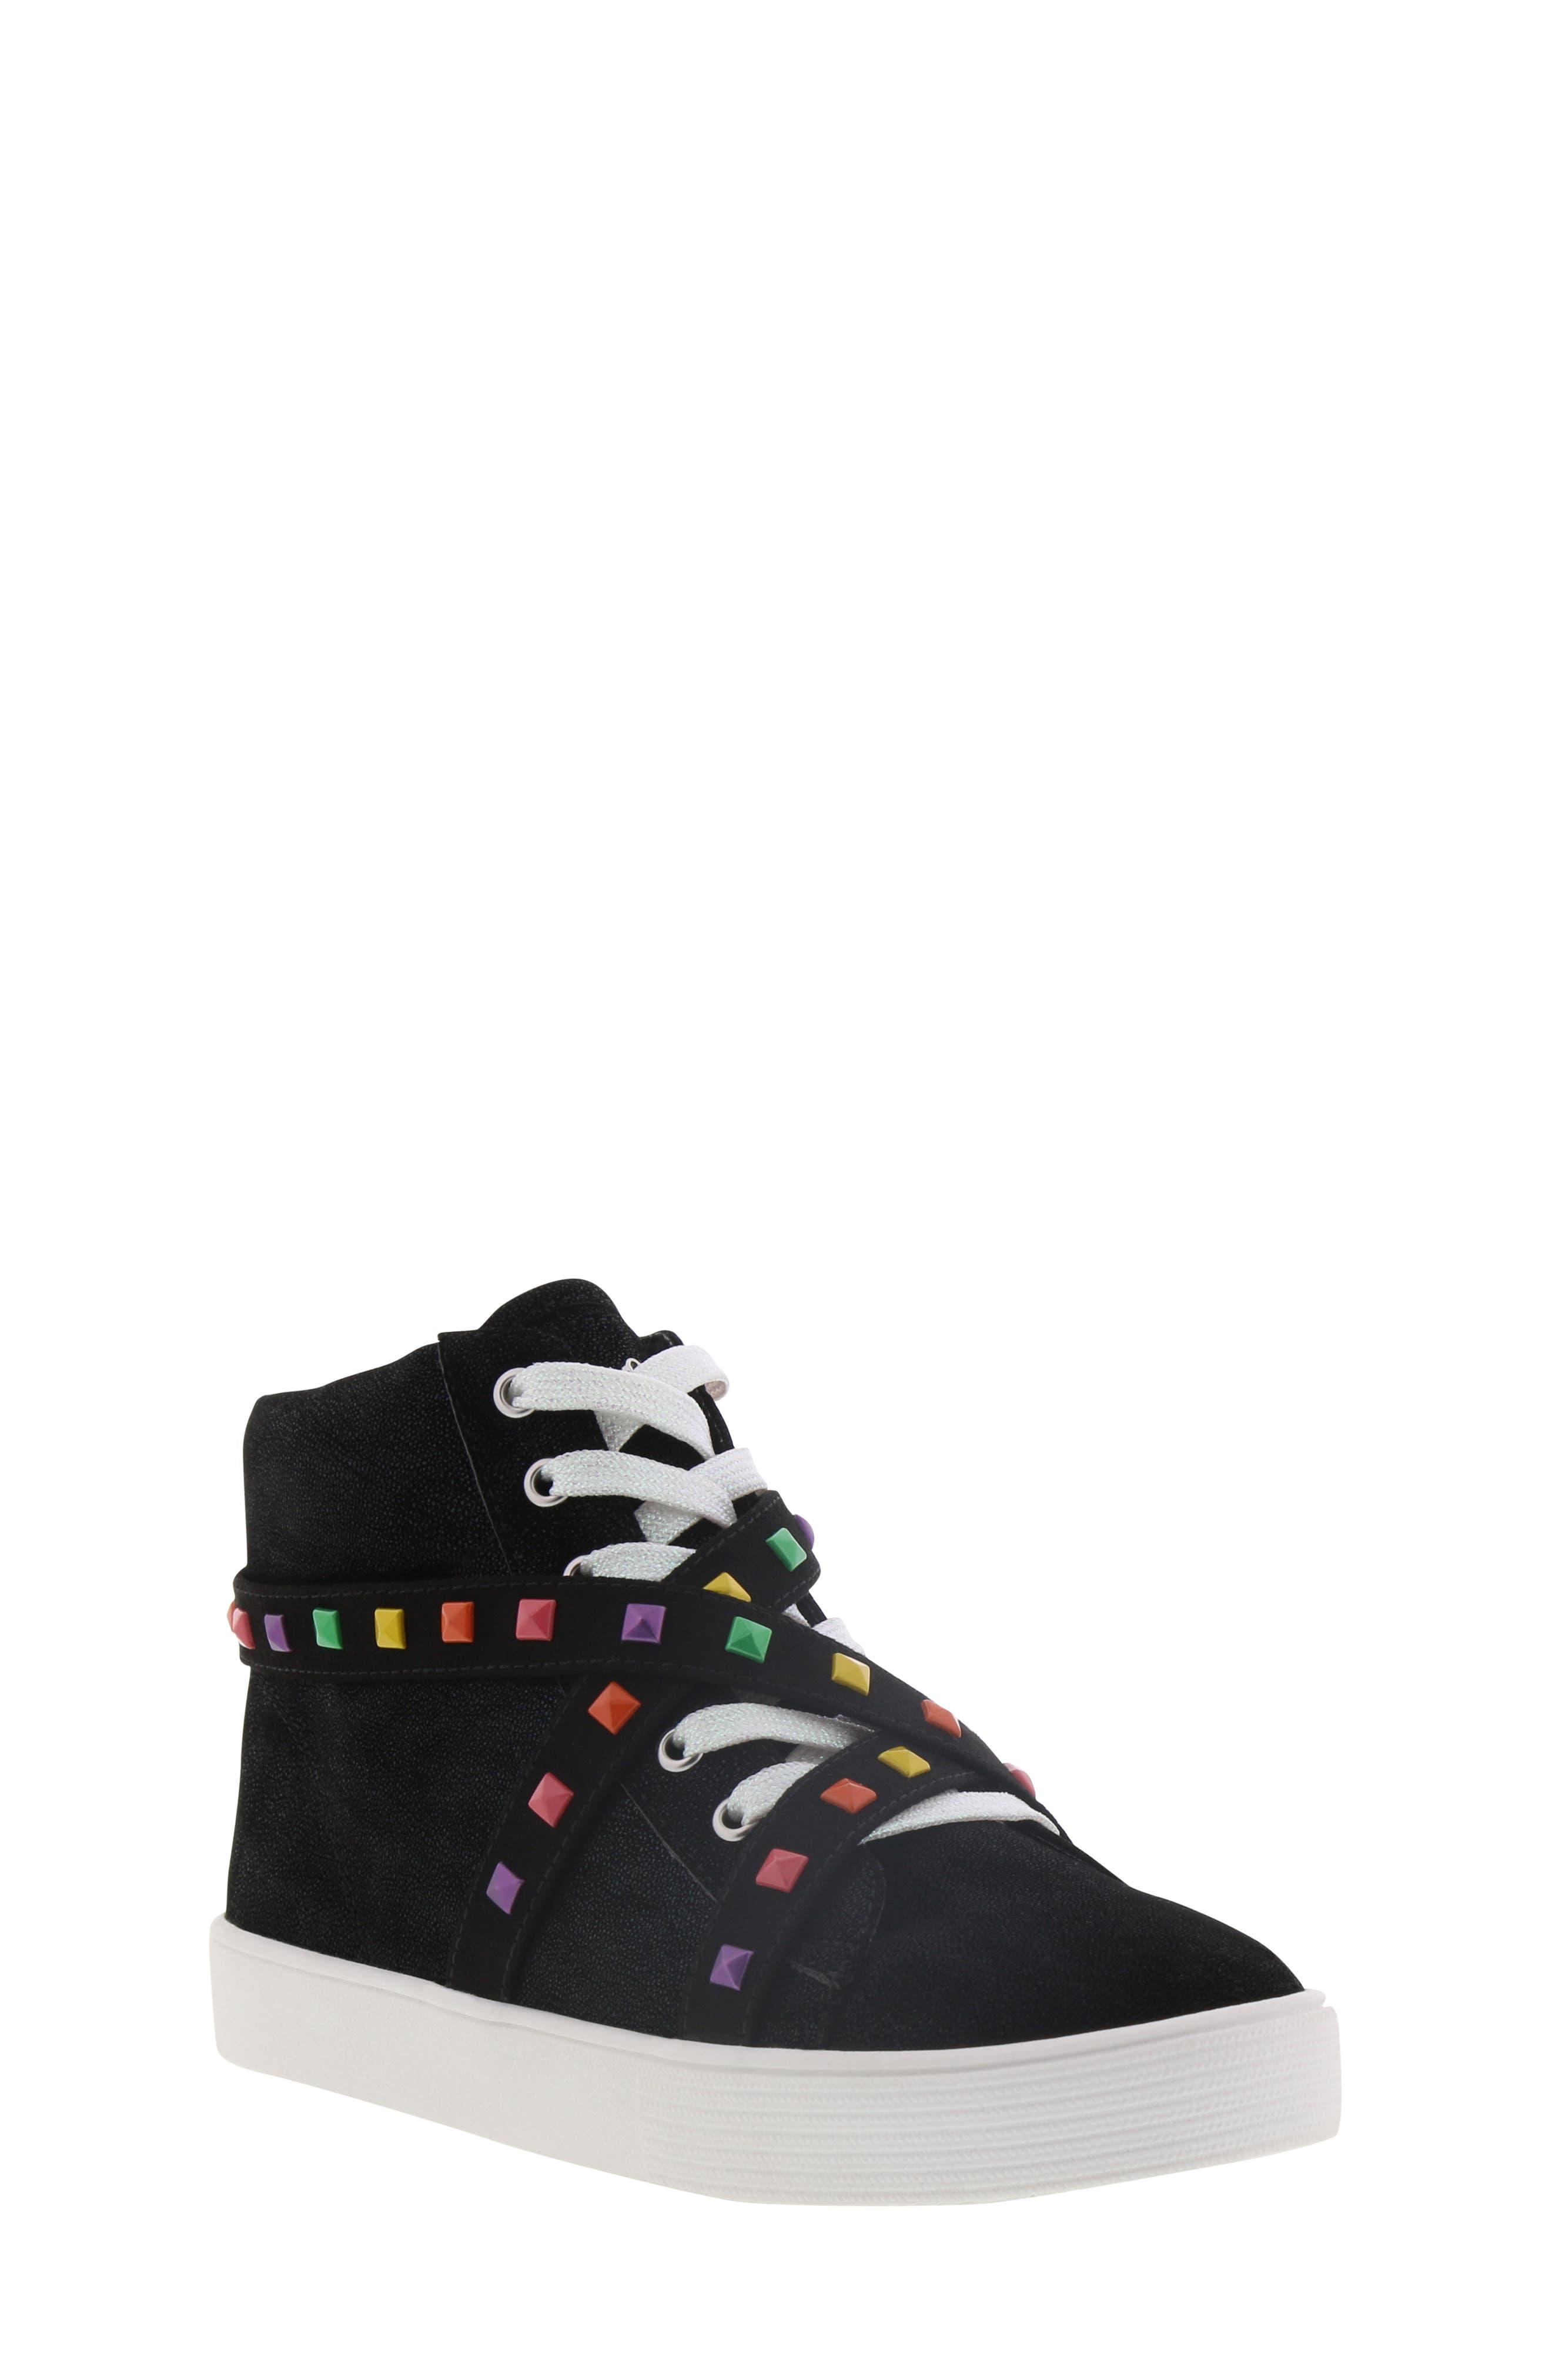 Girls' Sam Edelman Sneakers, Tennis Shoes & Basketball Shoes